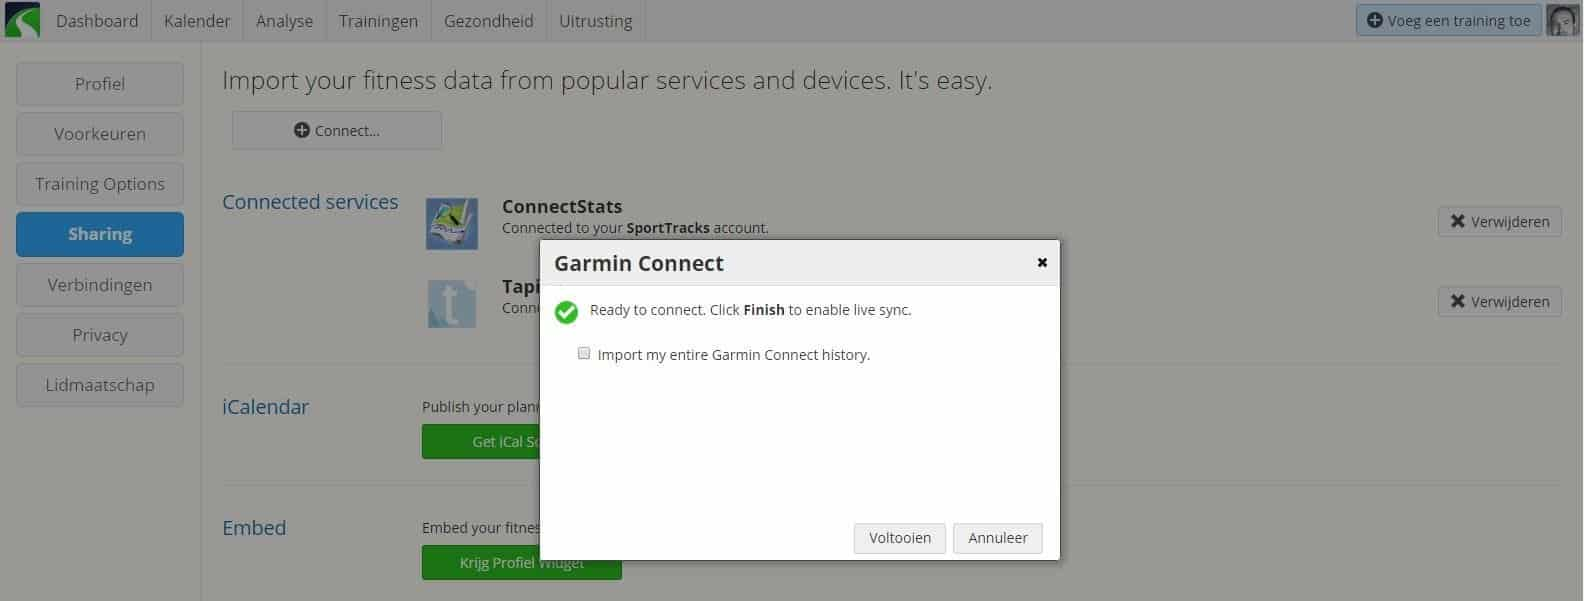 Garmin Connect synchroniseert nu automatisch met Sporttracks - Opfietsen